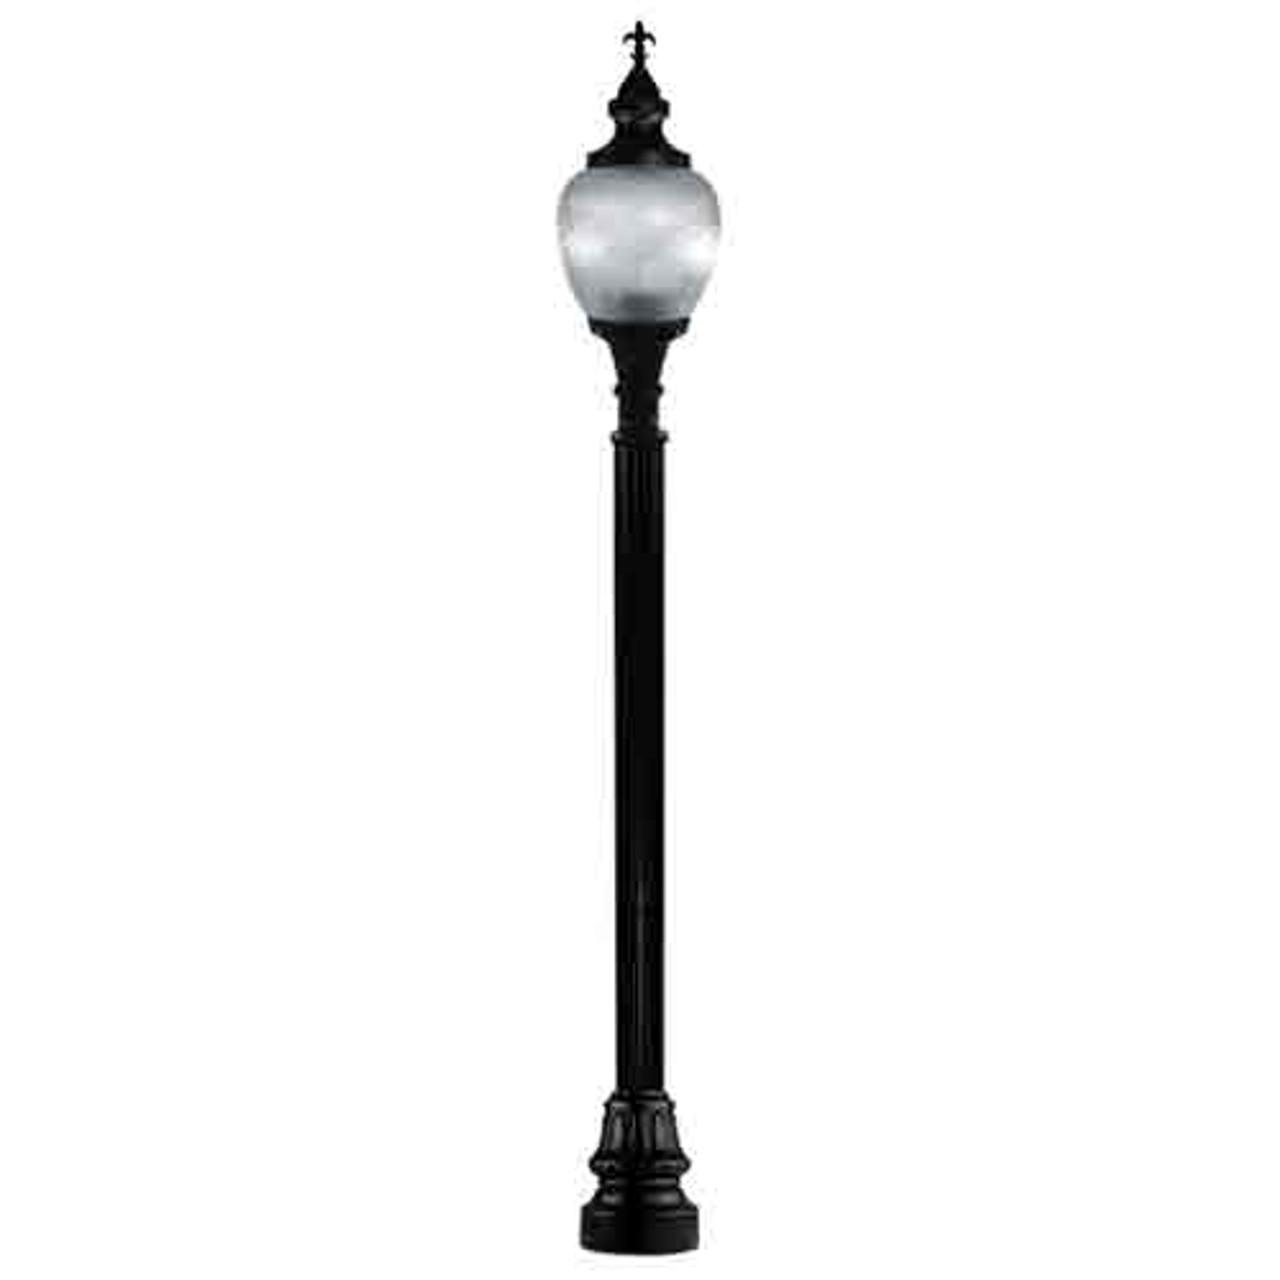 Standard Bostonian Historic Post Top on Pole